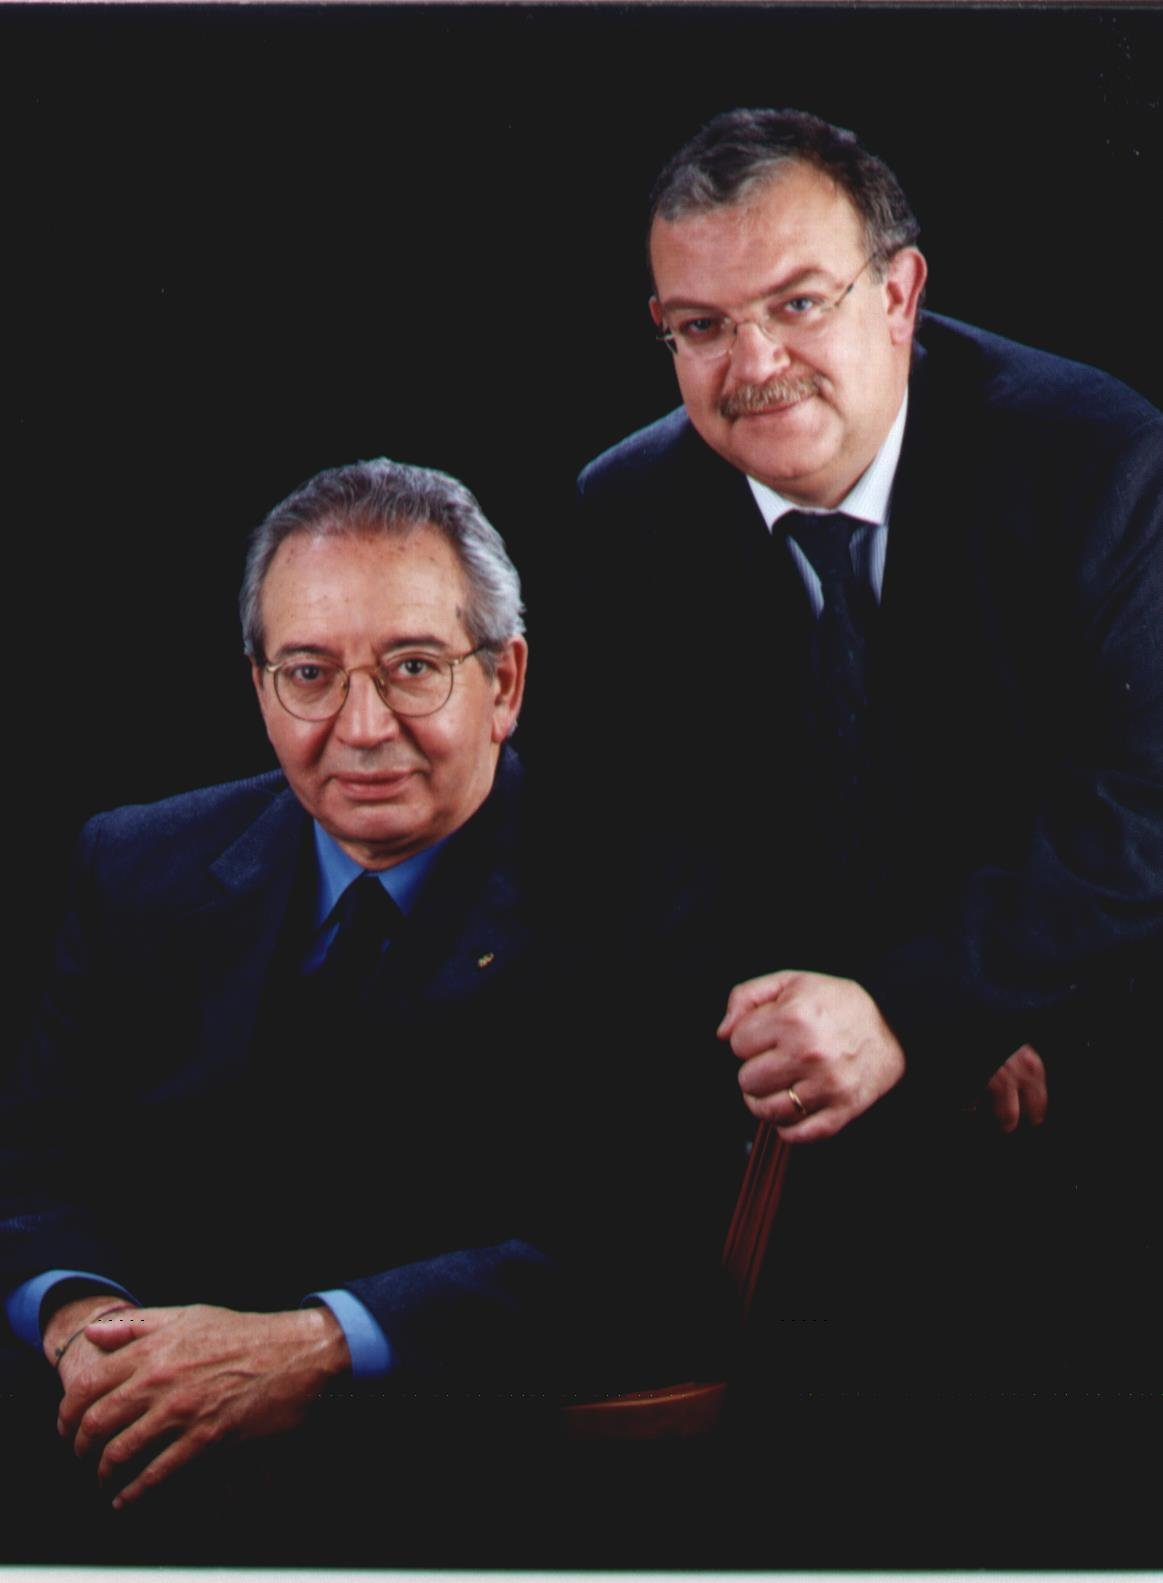 Srs. Pasqual Balanya Crespo i Josep Tresserras Basela